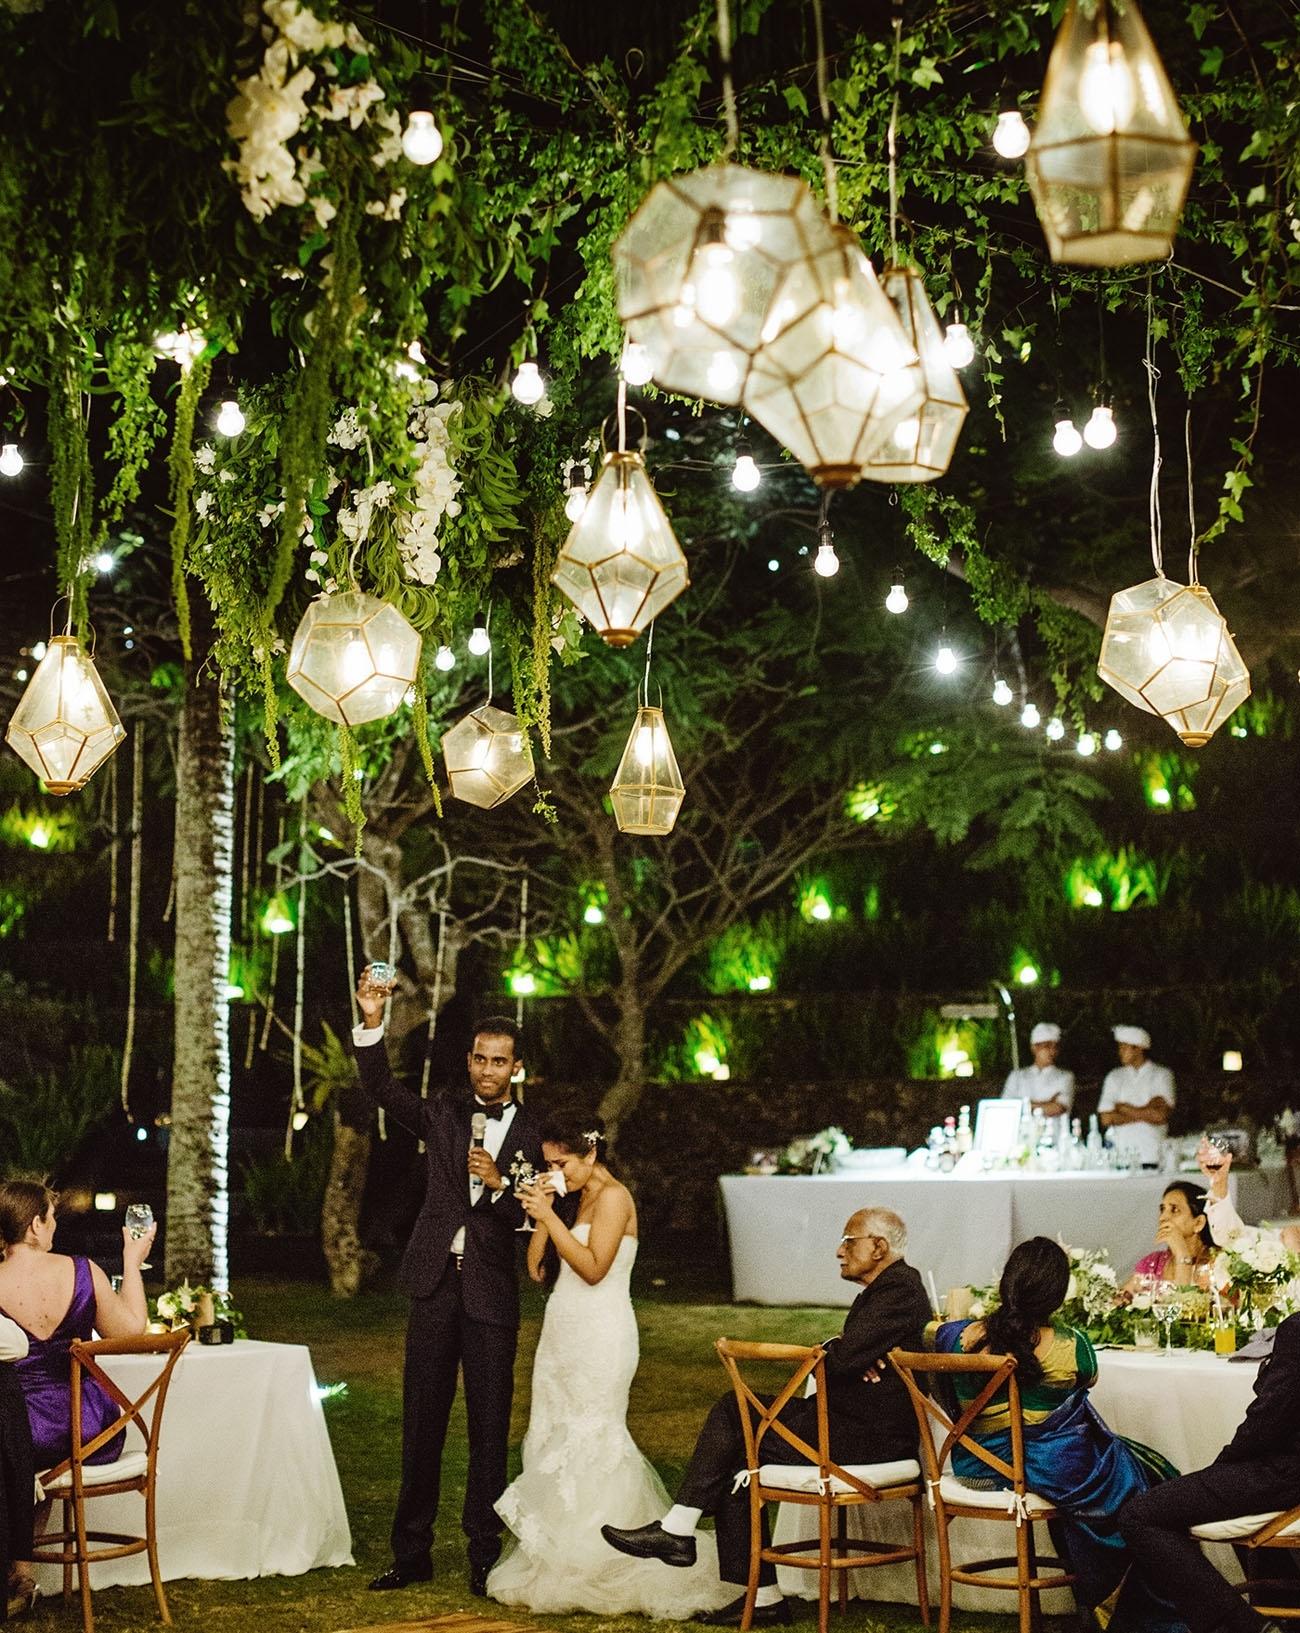 Outdoor Wedding Lights Decorations – Outdoor Lighting Ideas Regarding Outdoor Lanterns For Wedding (View 16 of 20)